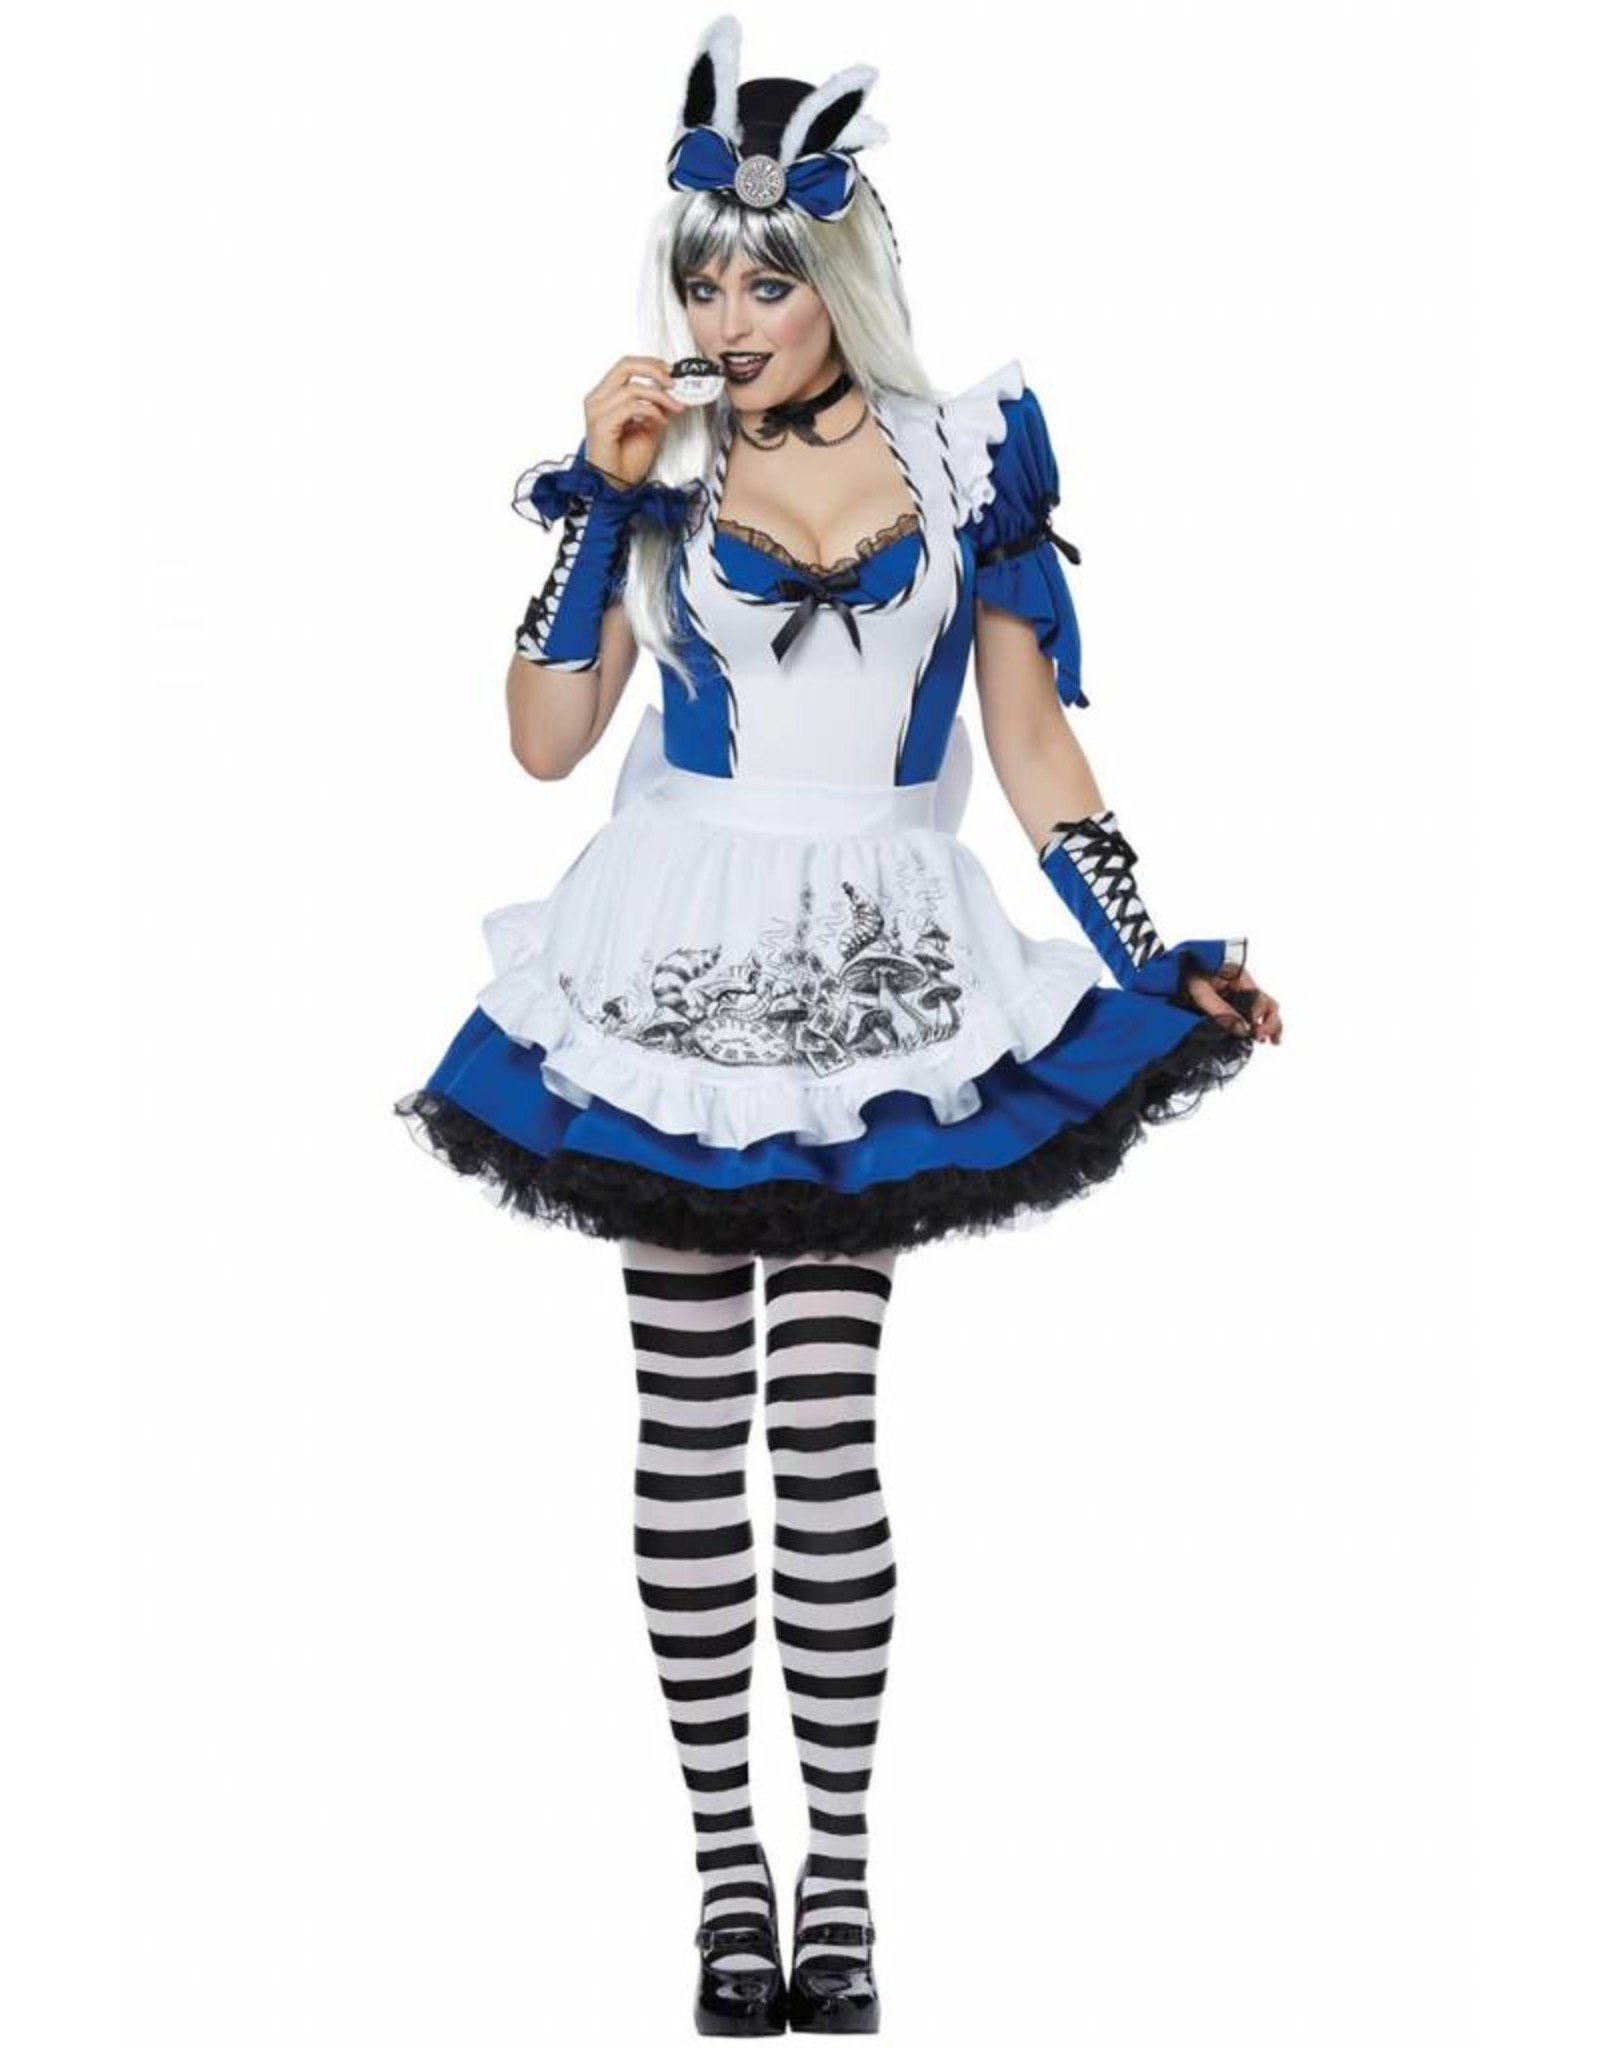 California Costume Mad Alice